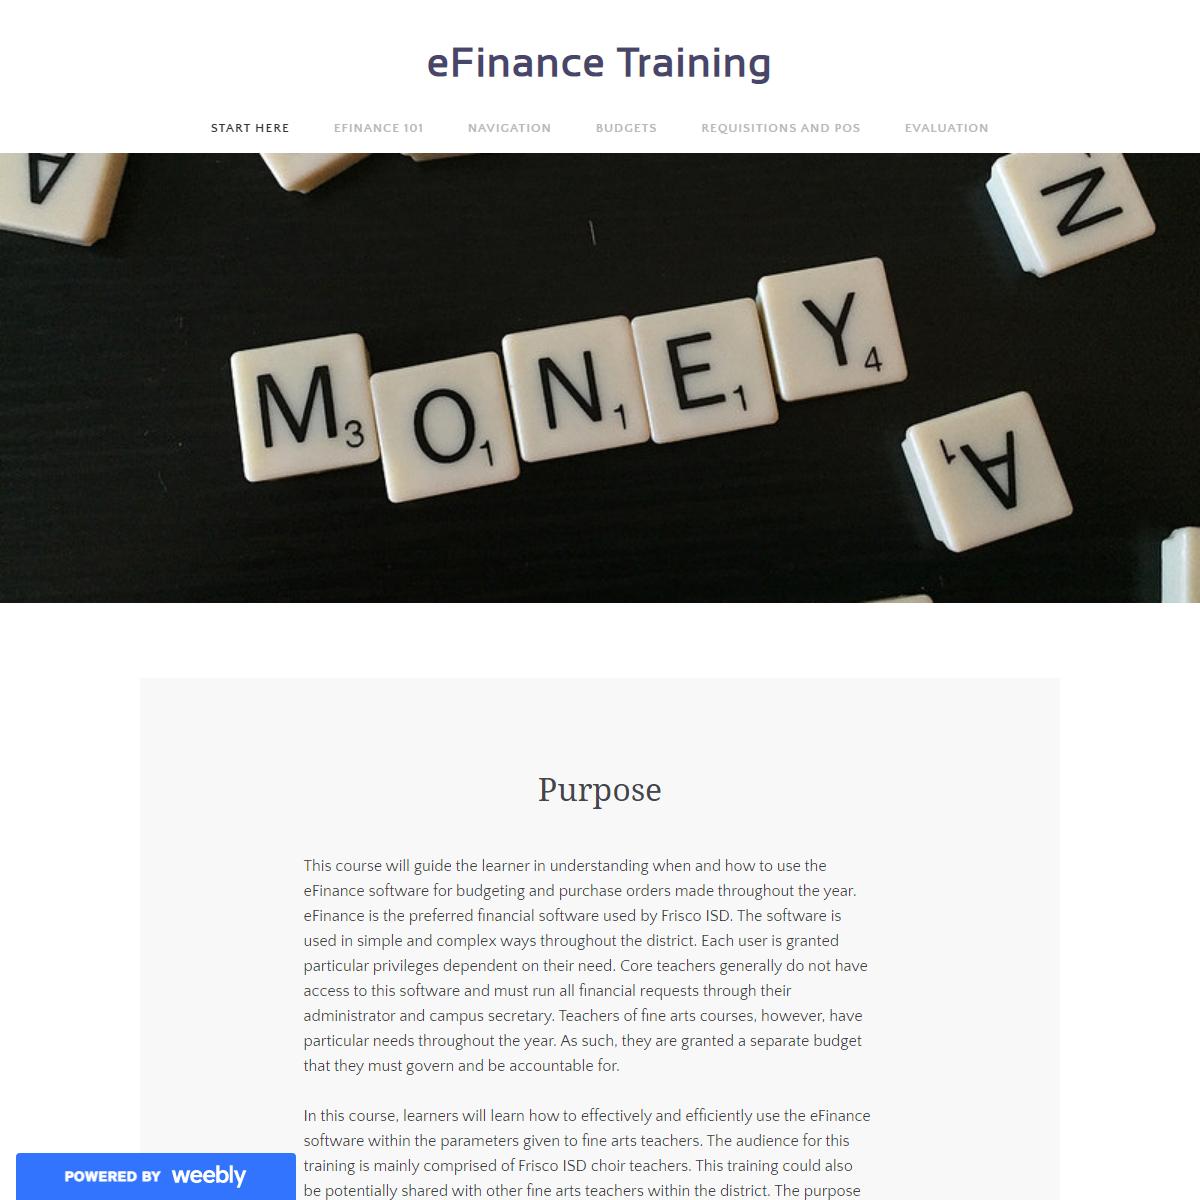 eFinance Training - Start Here